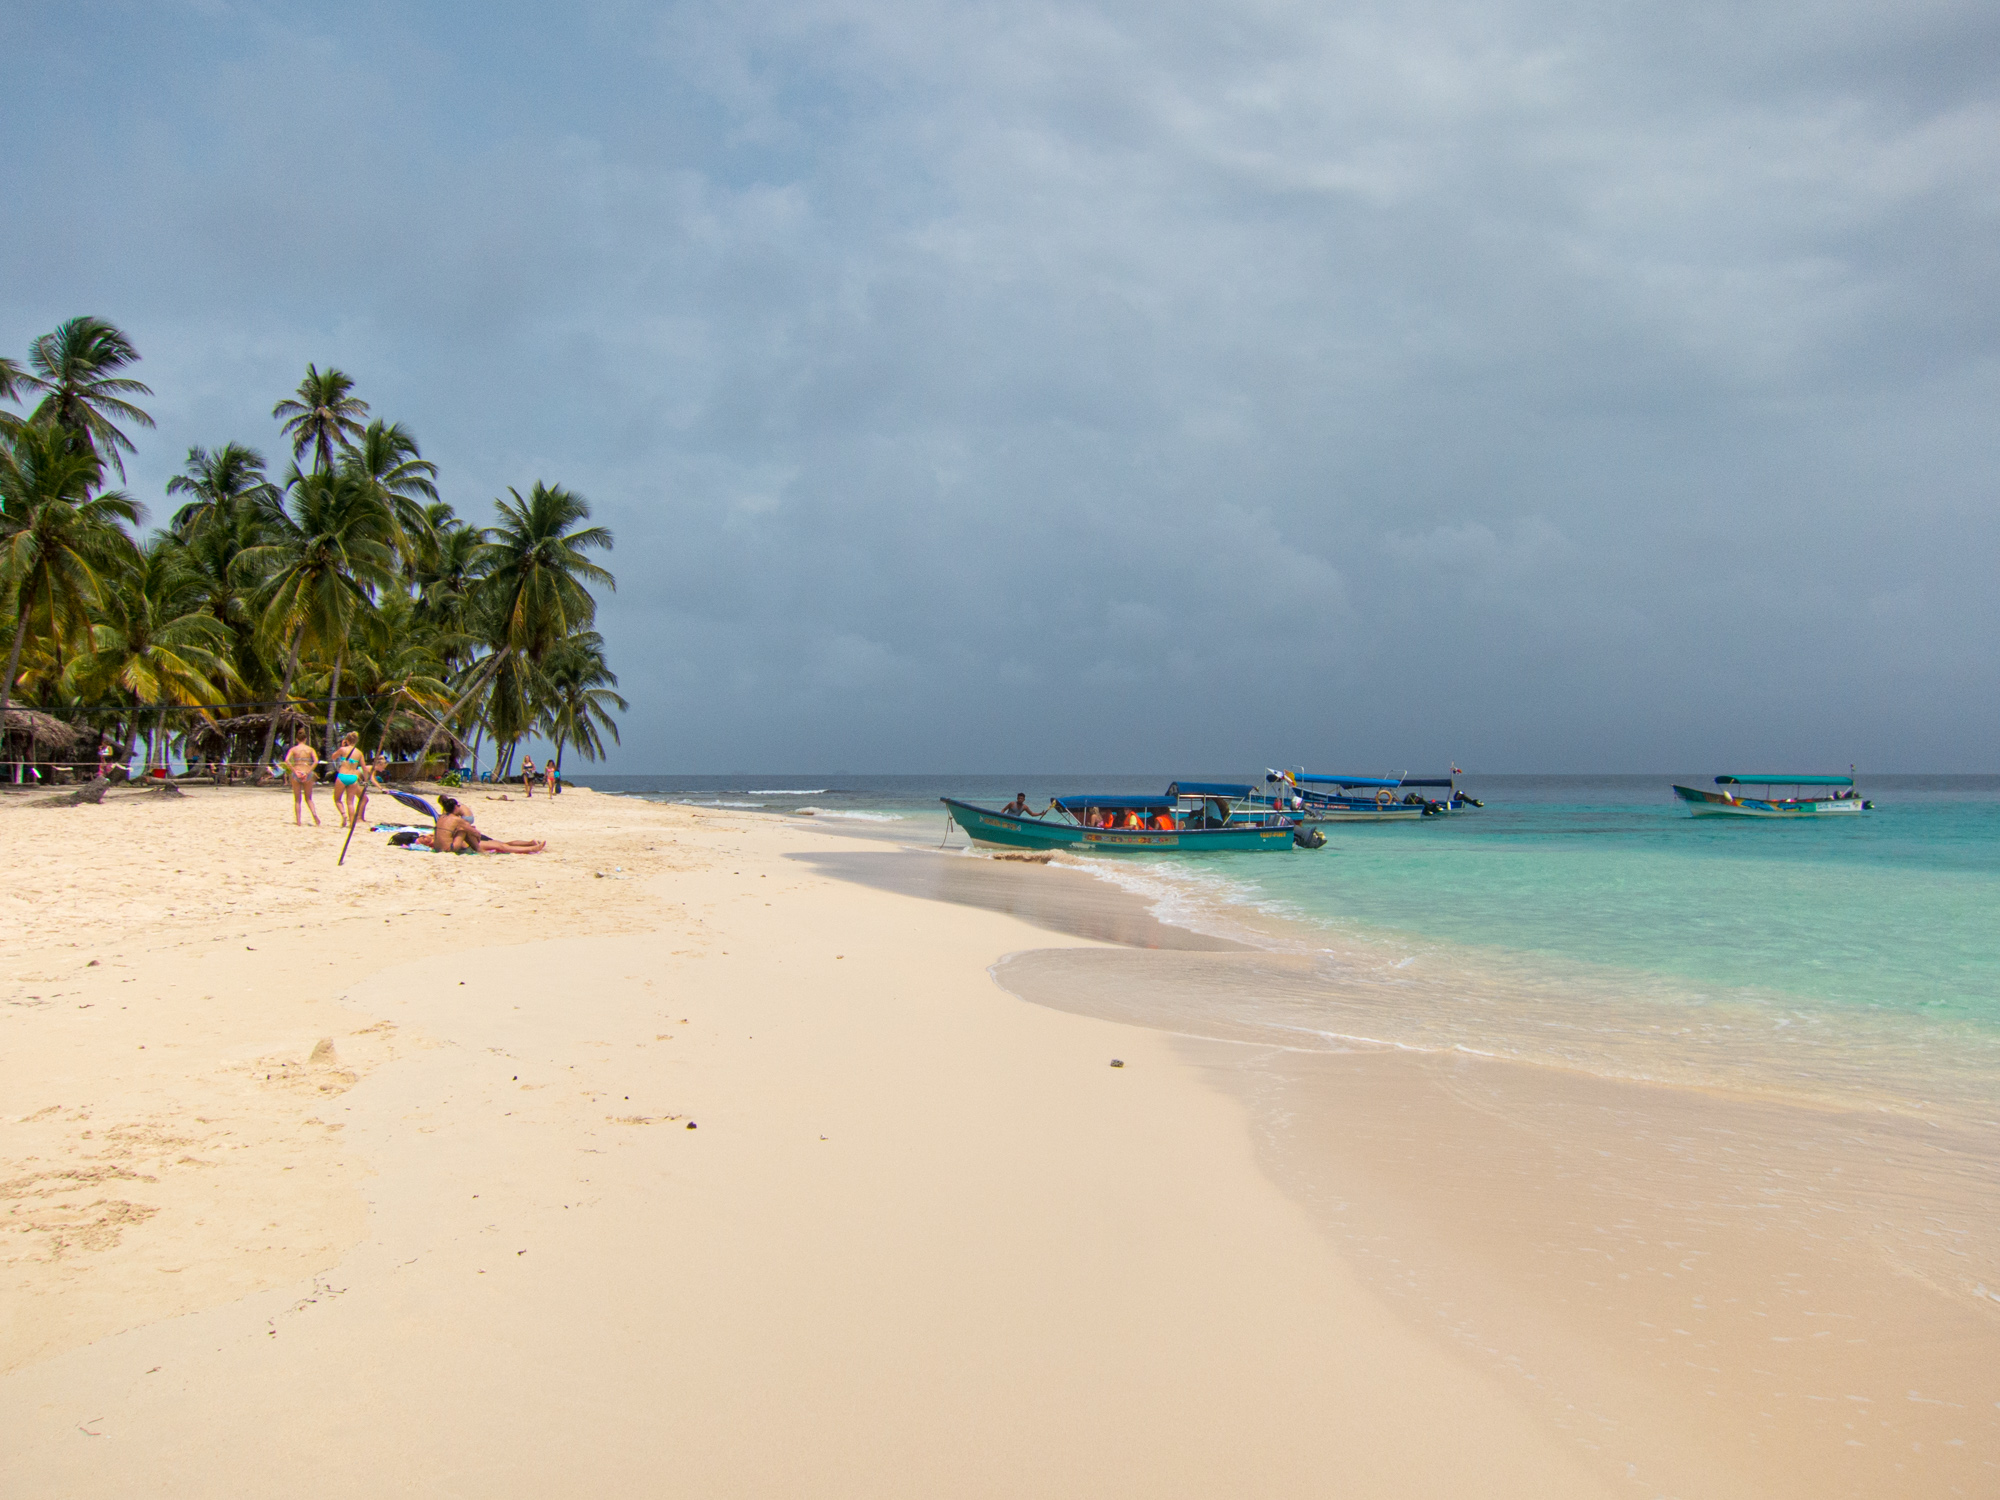 Dog Island beach in San Blas